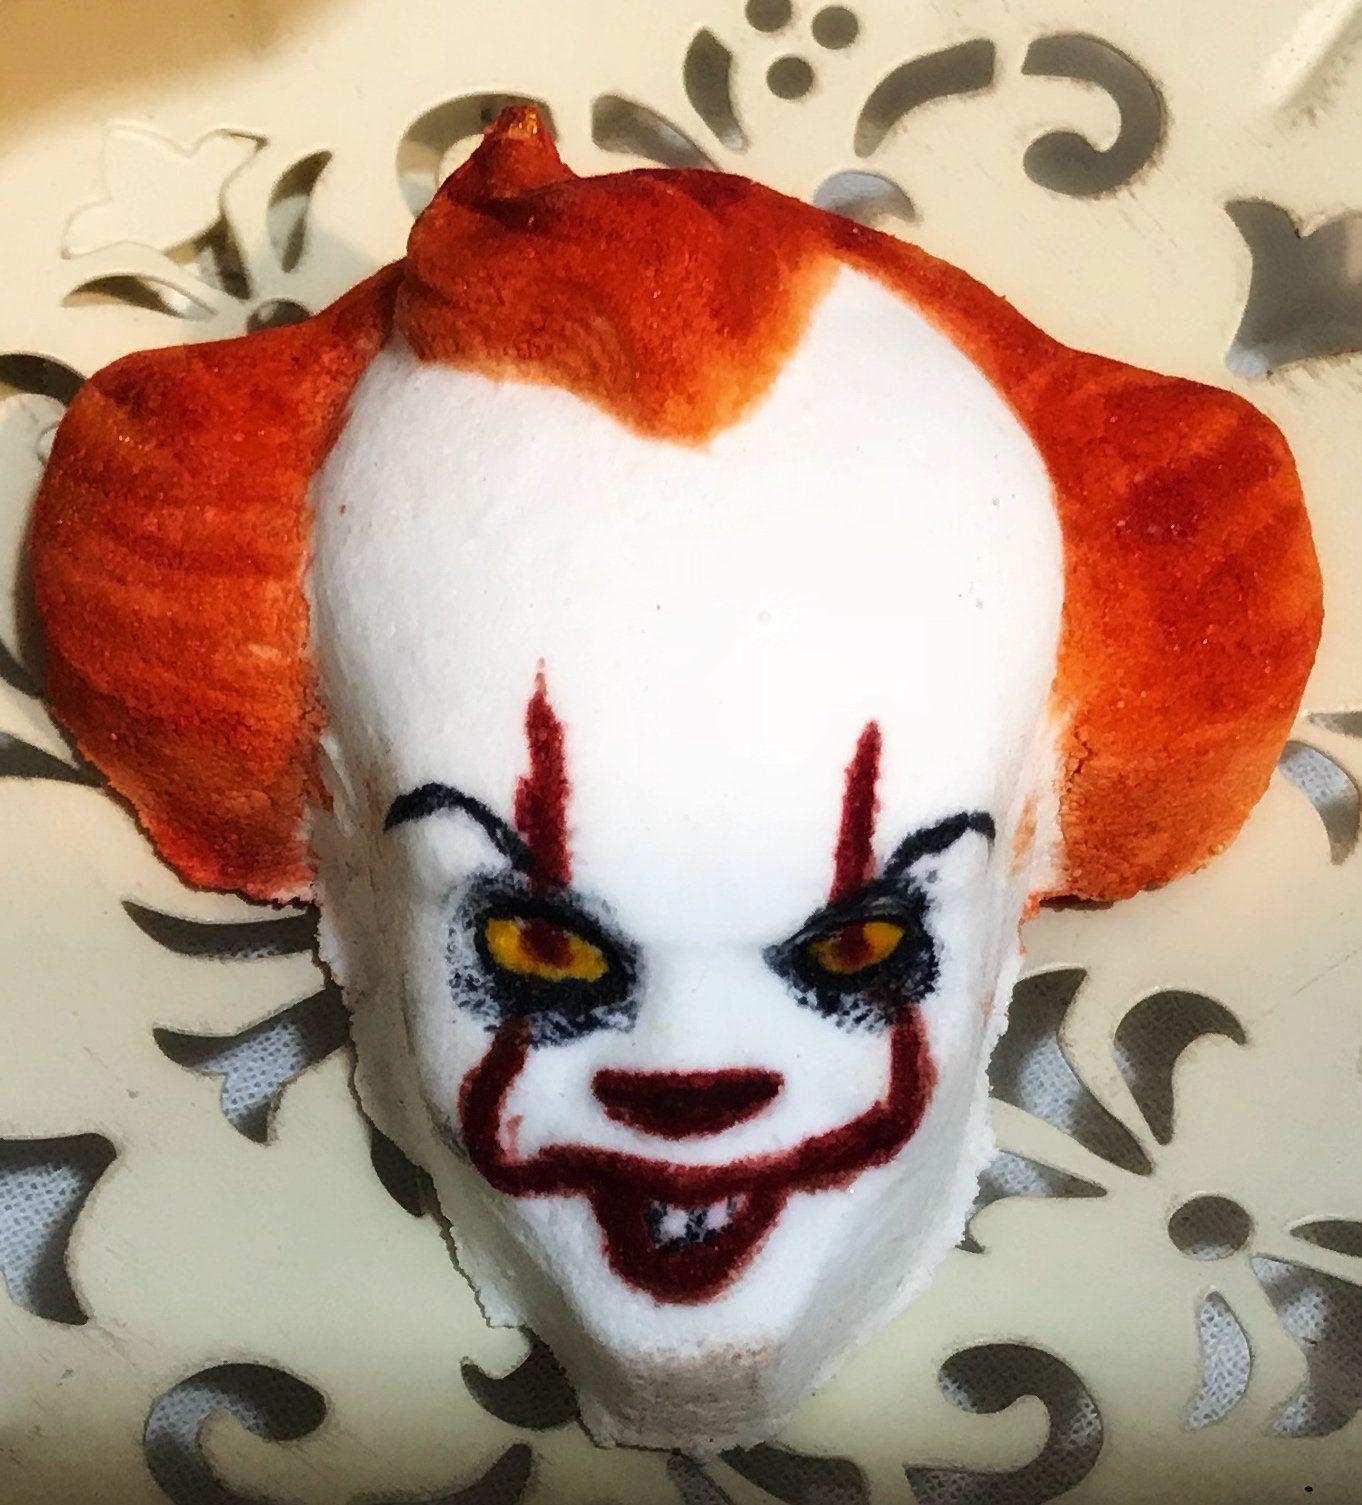 Clown Penny Horror Bathbombs Bath Bomb Gothic